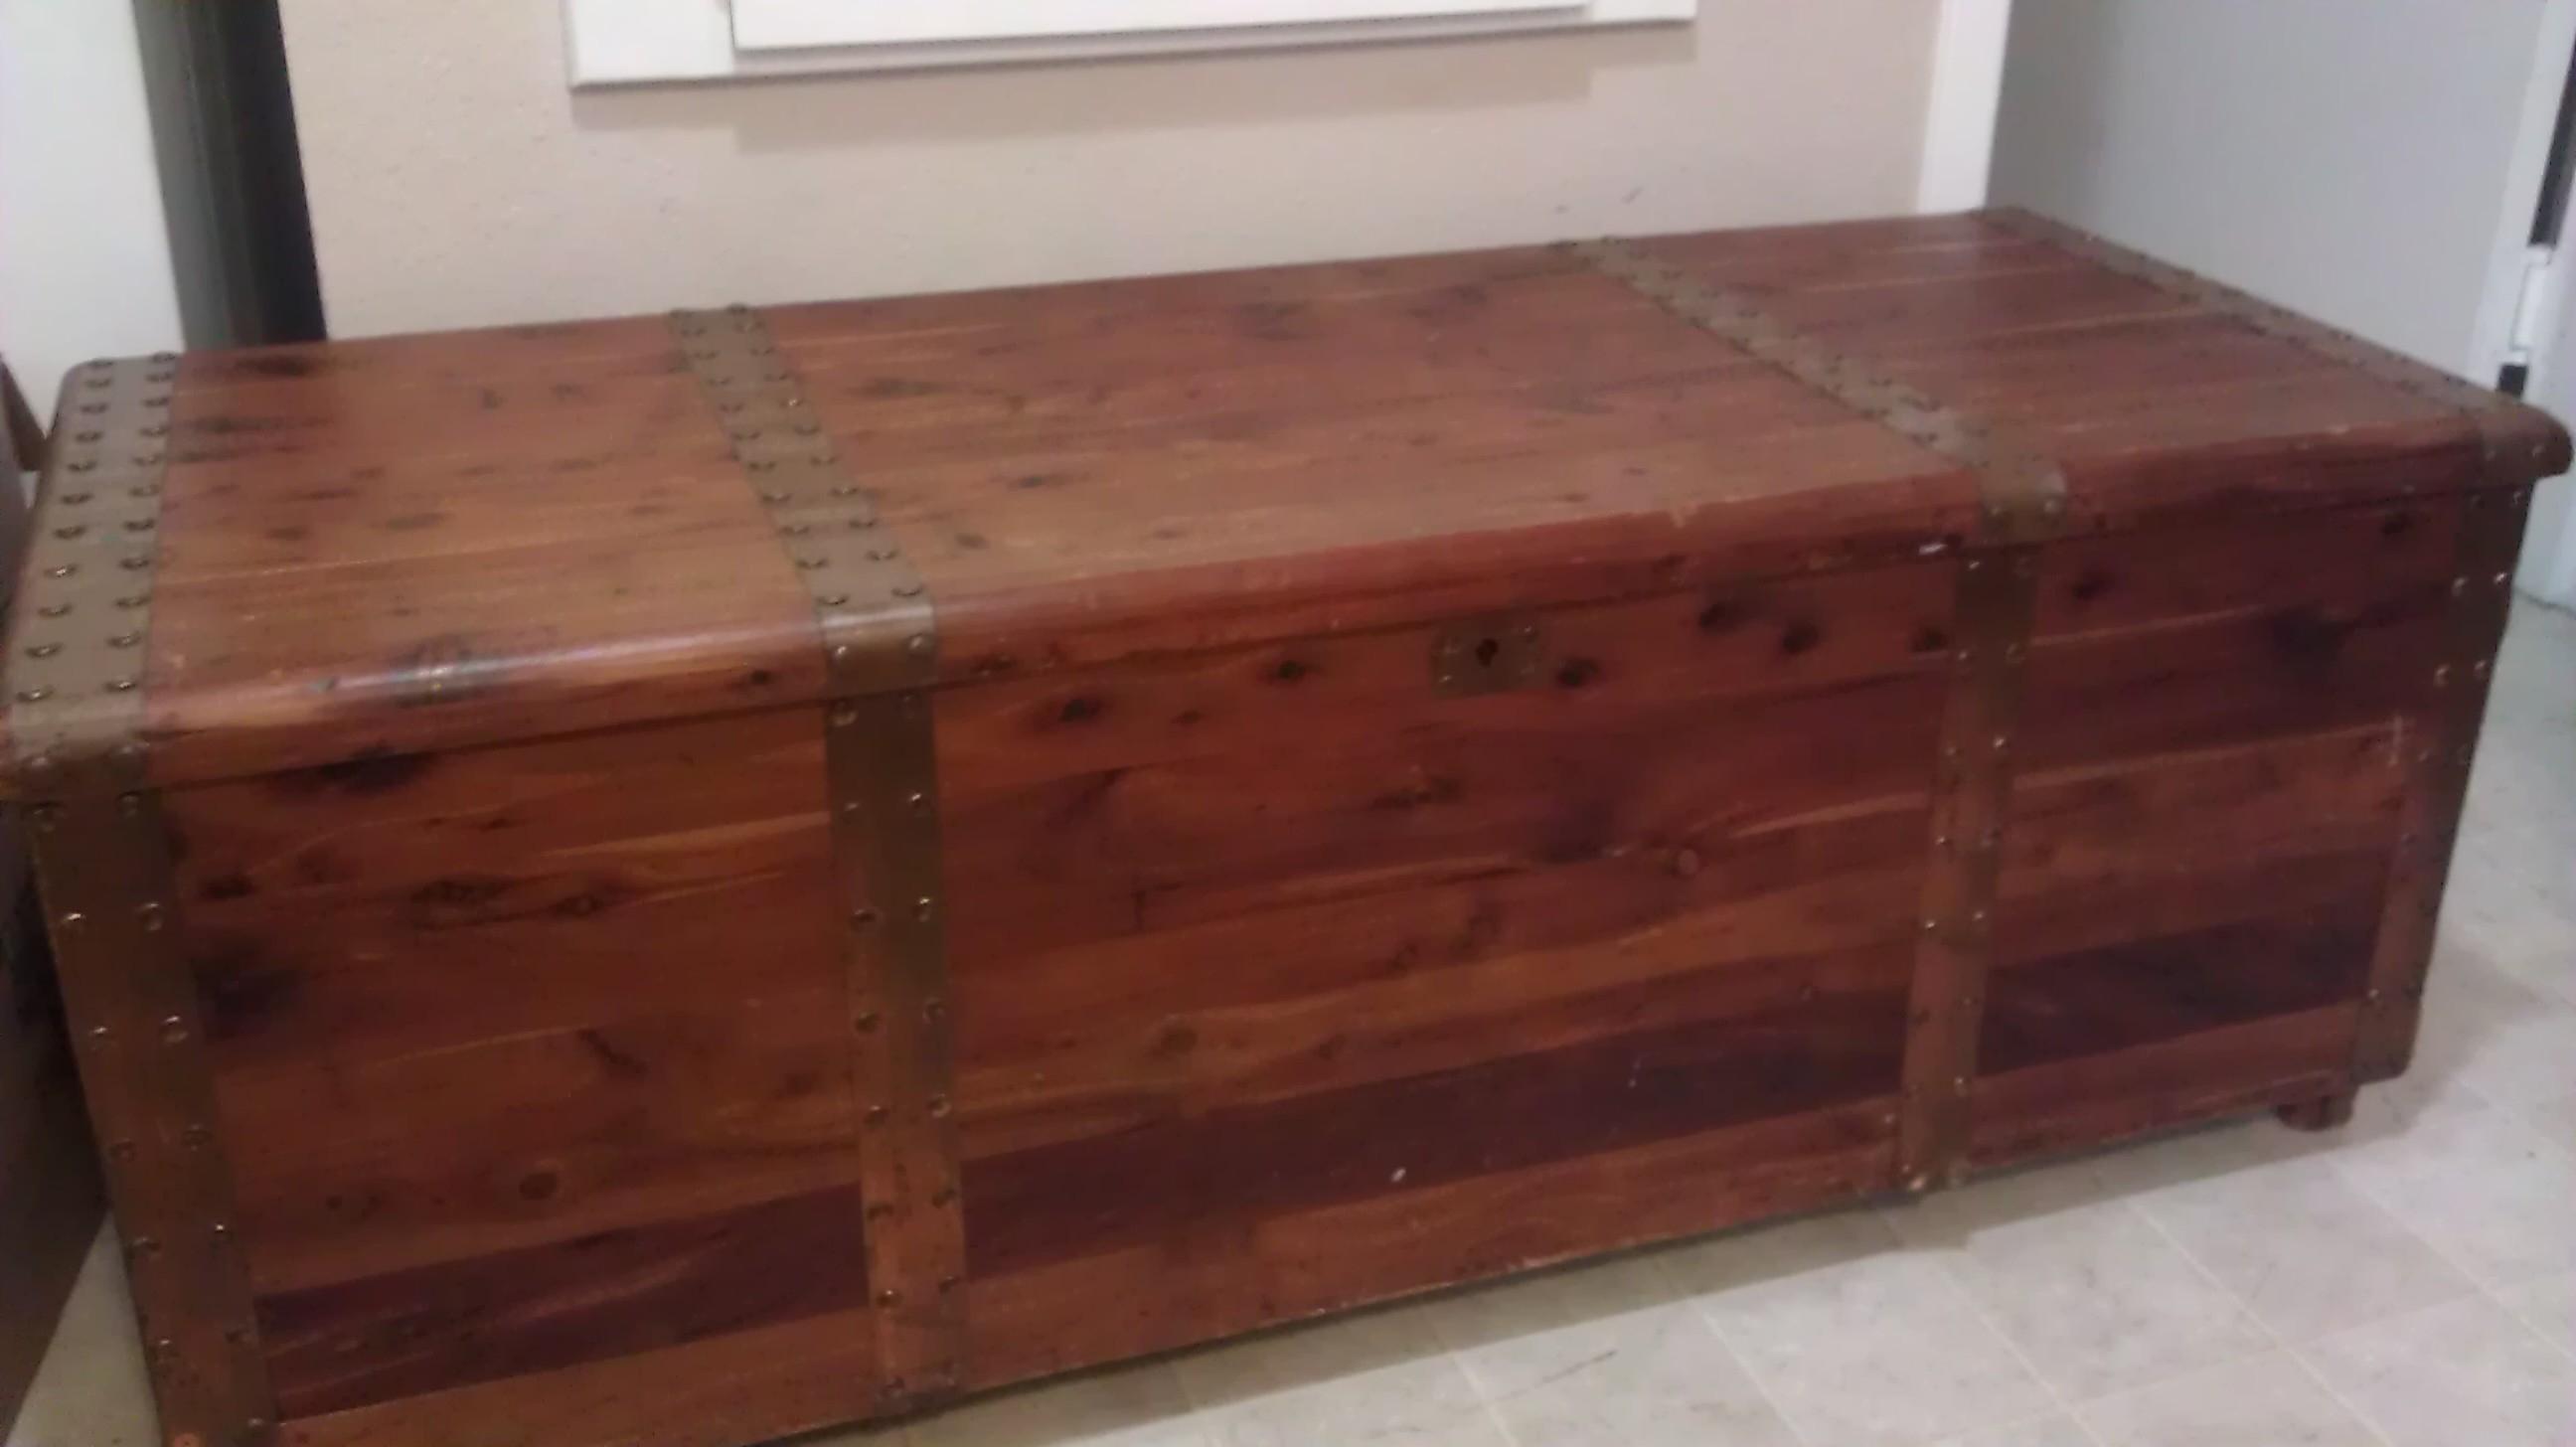 Acme Cedar Chest Company antique appraisal | InstAppraisal